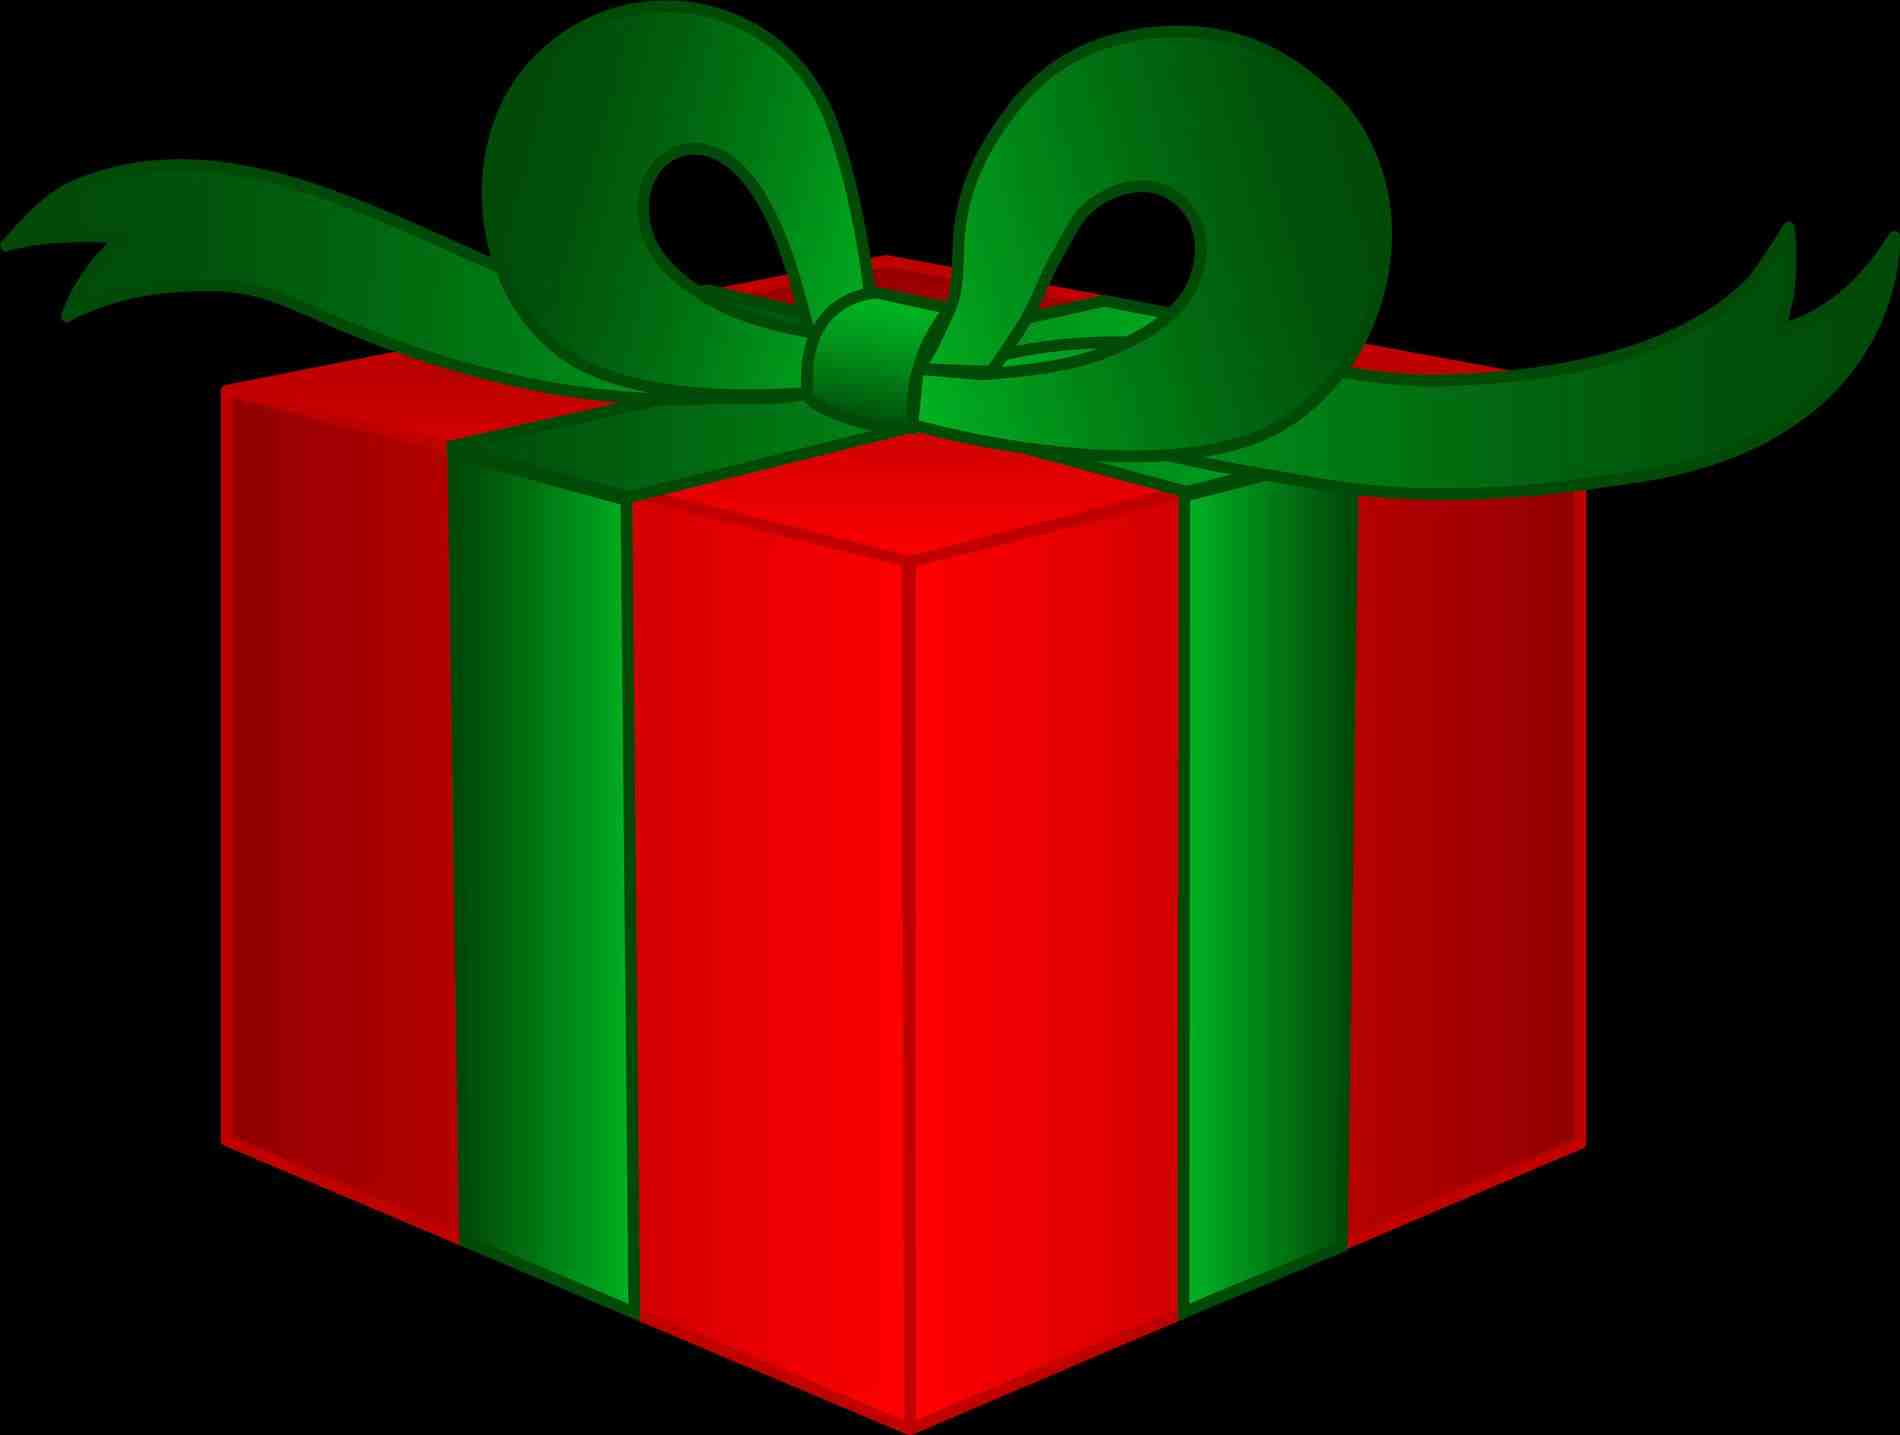 1900x1435 Cute Christmas Present Clip Art Cheminee.website